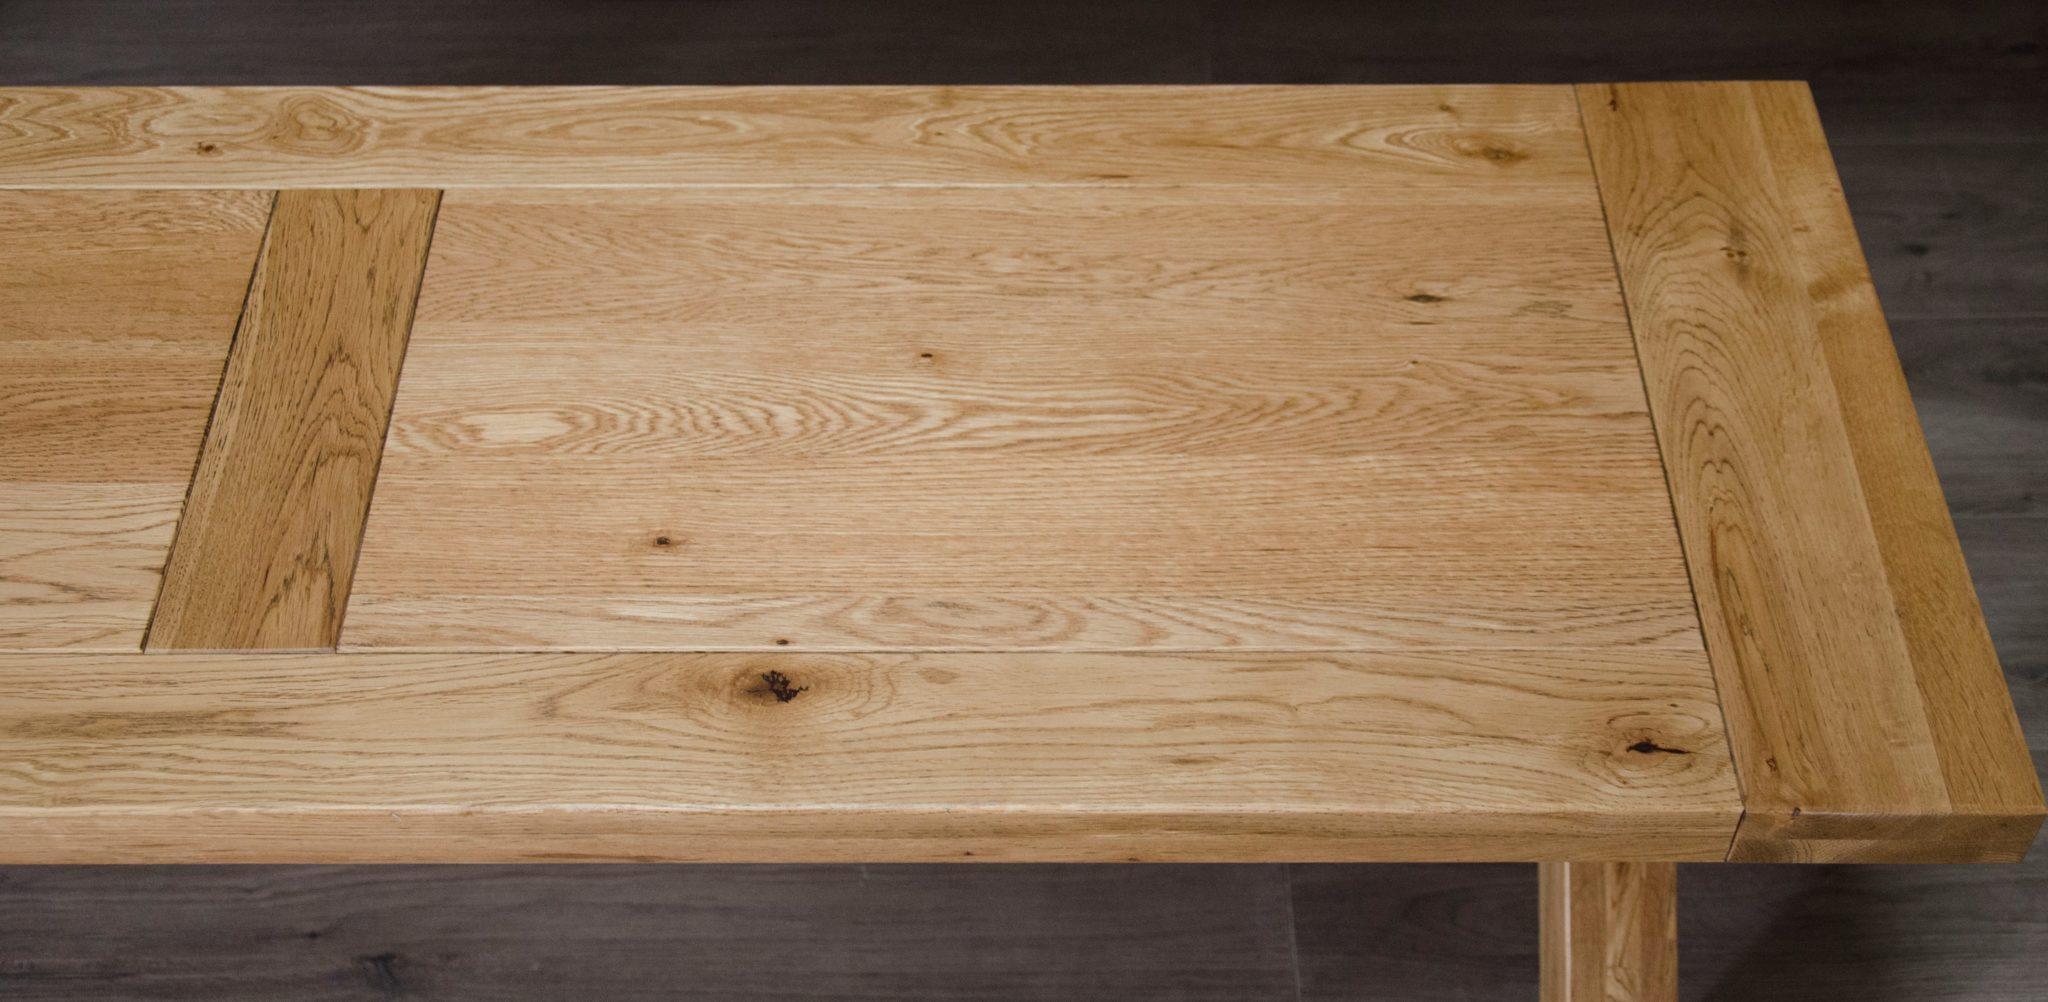 Melford oak cross leg bench